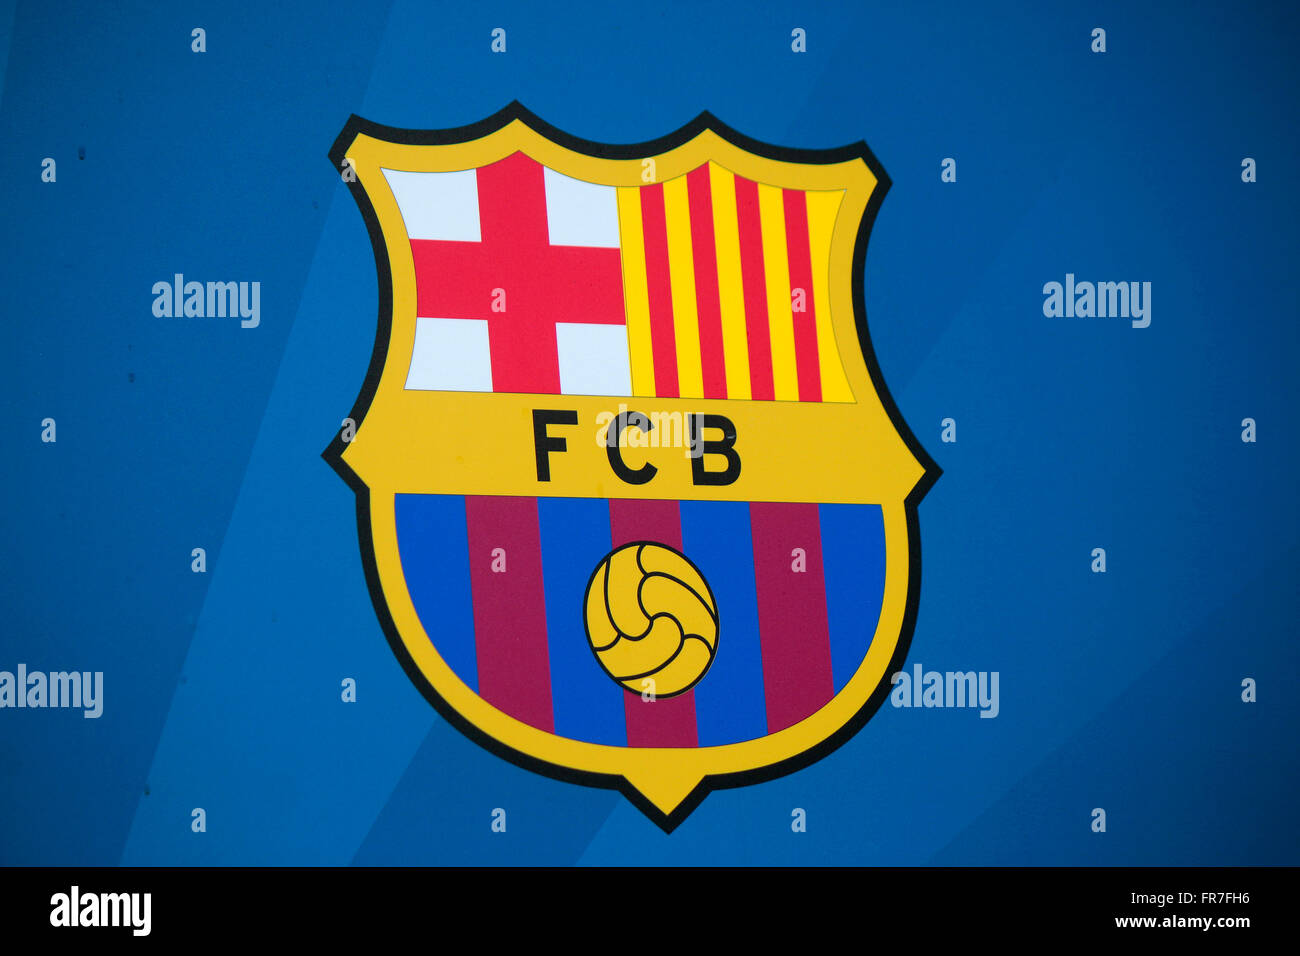 das Logo des 'FC Barcelona', Berlin. - Stock Image